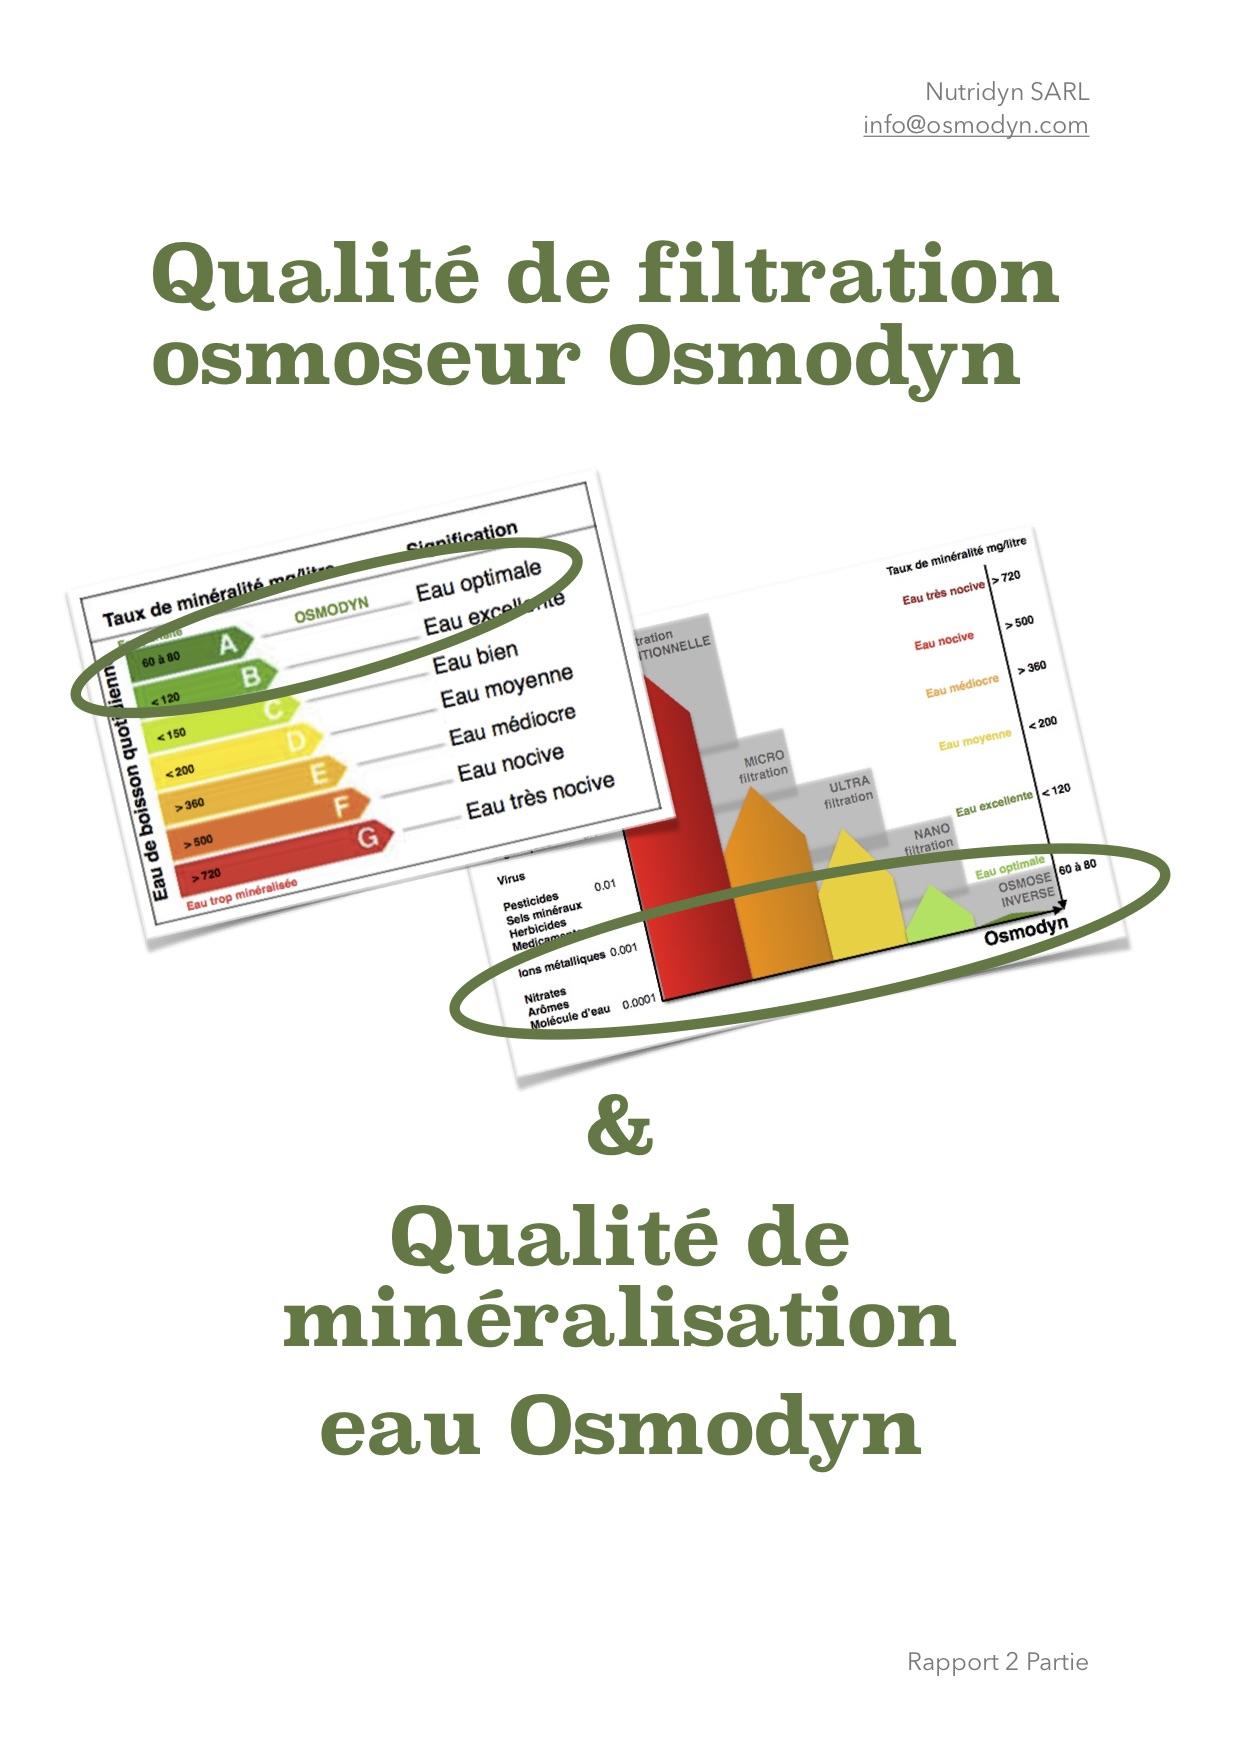 Osmodyn certification qualité